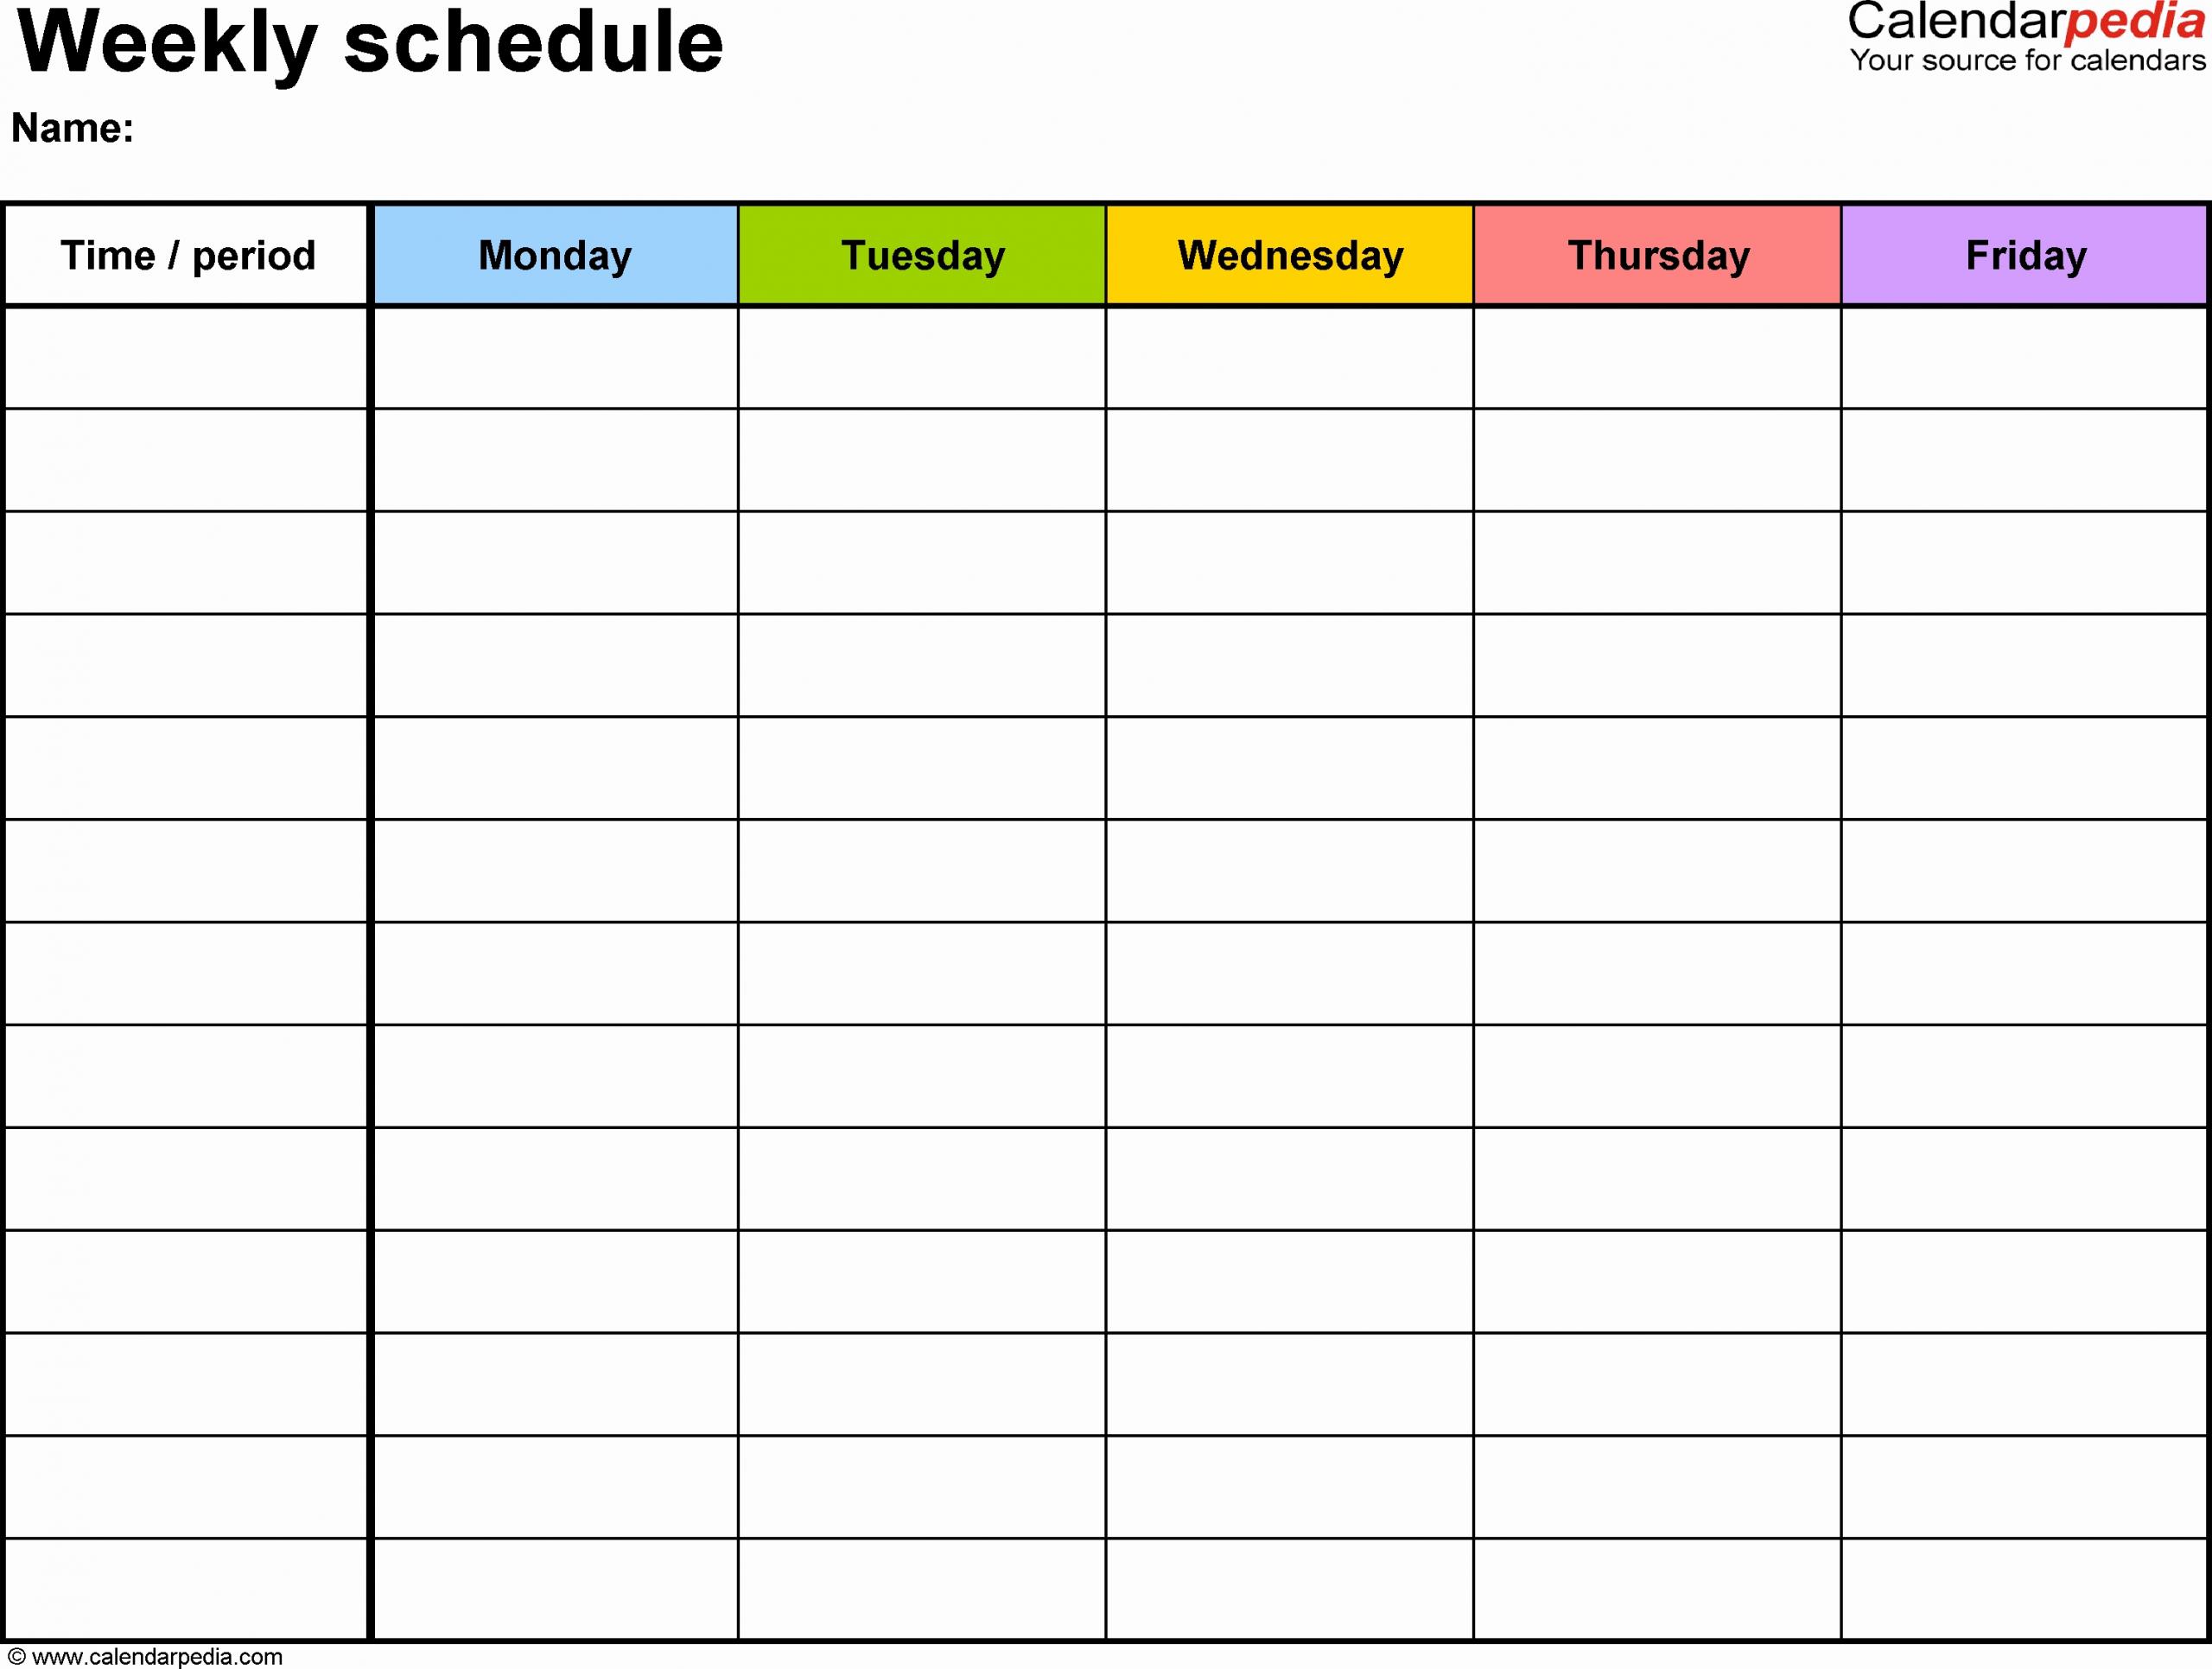 Depo Provera Calendar 2020 Does It Change | Calendar Depo Shot Cycle Printable